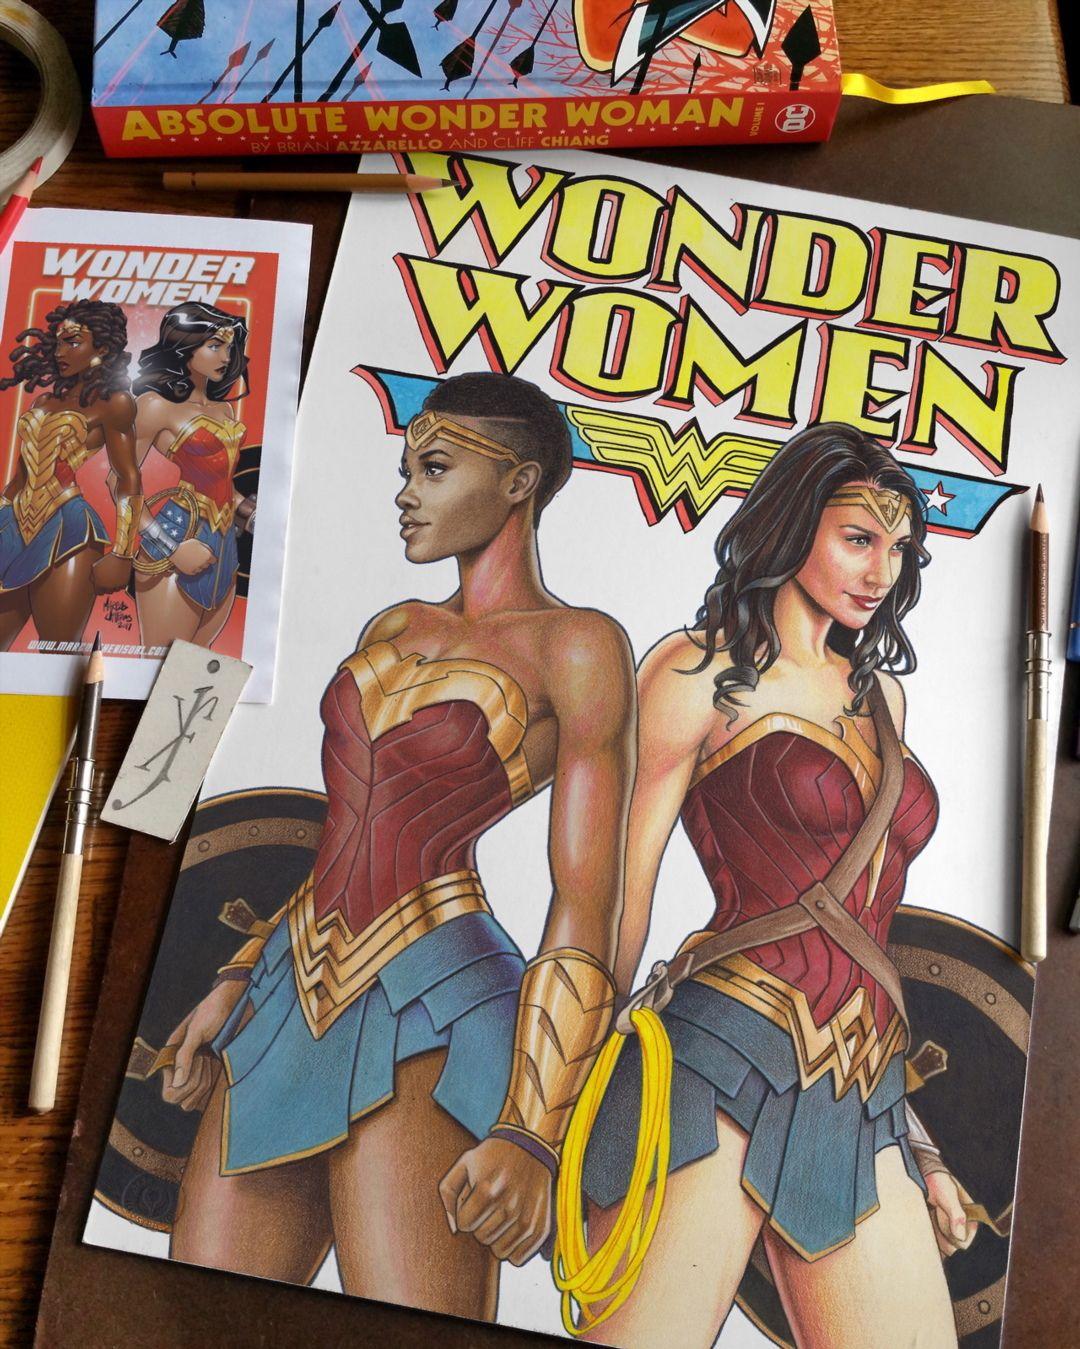 4 045 Likes 58 Comments On Twitter Choccitycomics Chocolatecitycomics On Instagram Afternoon Guys Wonder Woman Comic Wonder Woman Drawing Wonder Woman